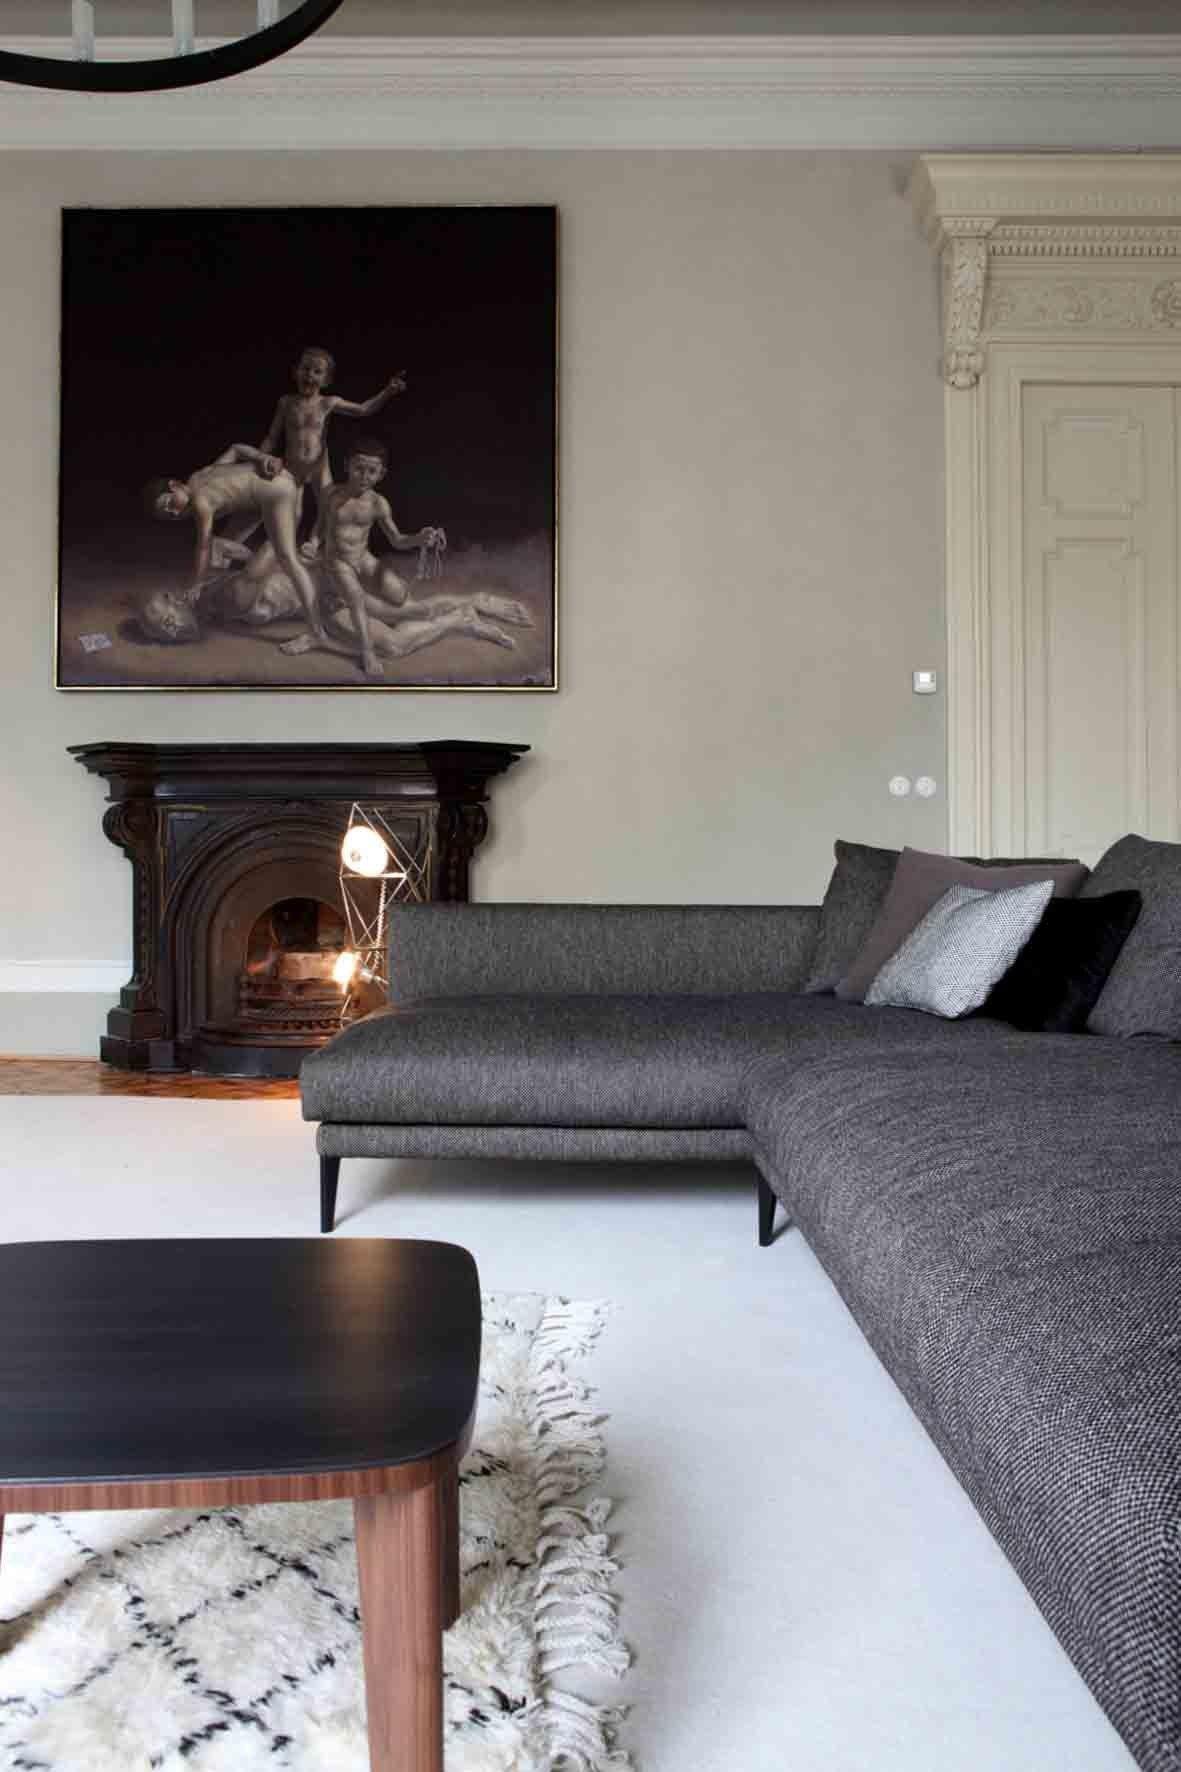 Upholstered fabric sofa CORAL by Bonaldo design Sergio Bicego : CORAL Bonaldo 226533 prelaa4295e3 from www.archiproducts.com size 1181 x 1772 jpeg 150kB